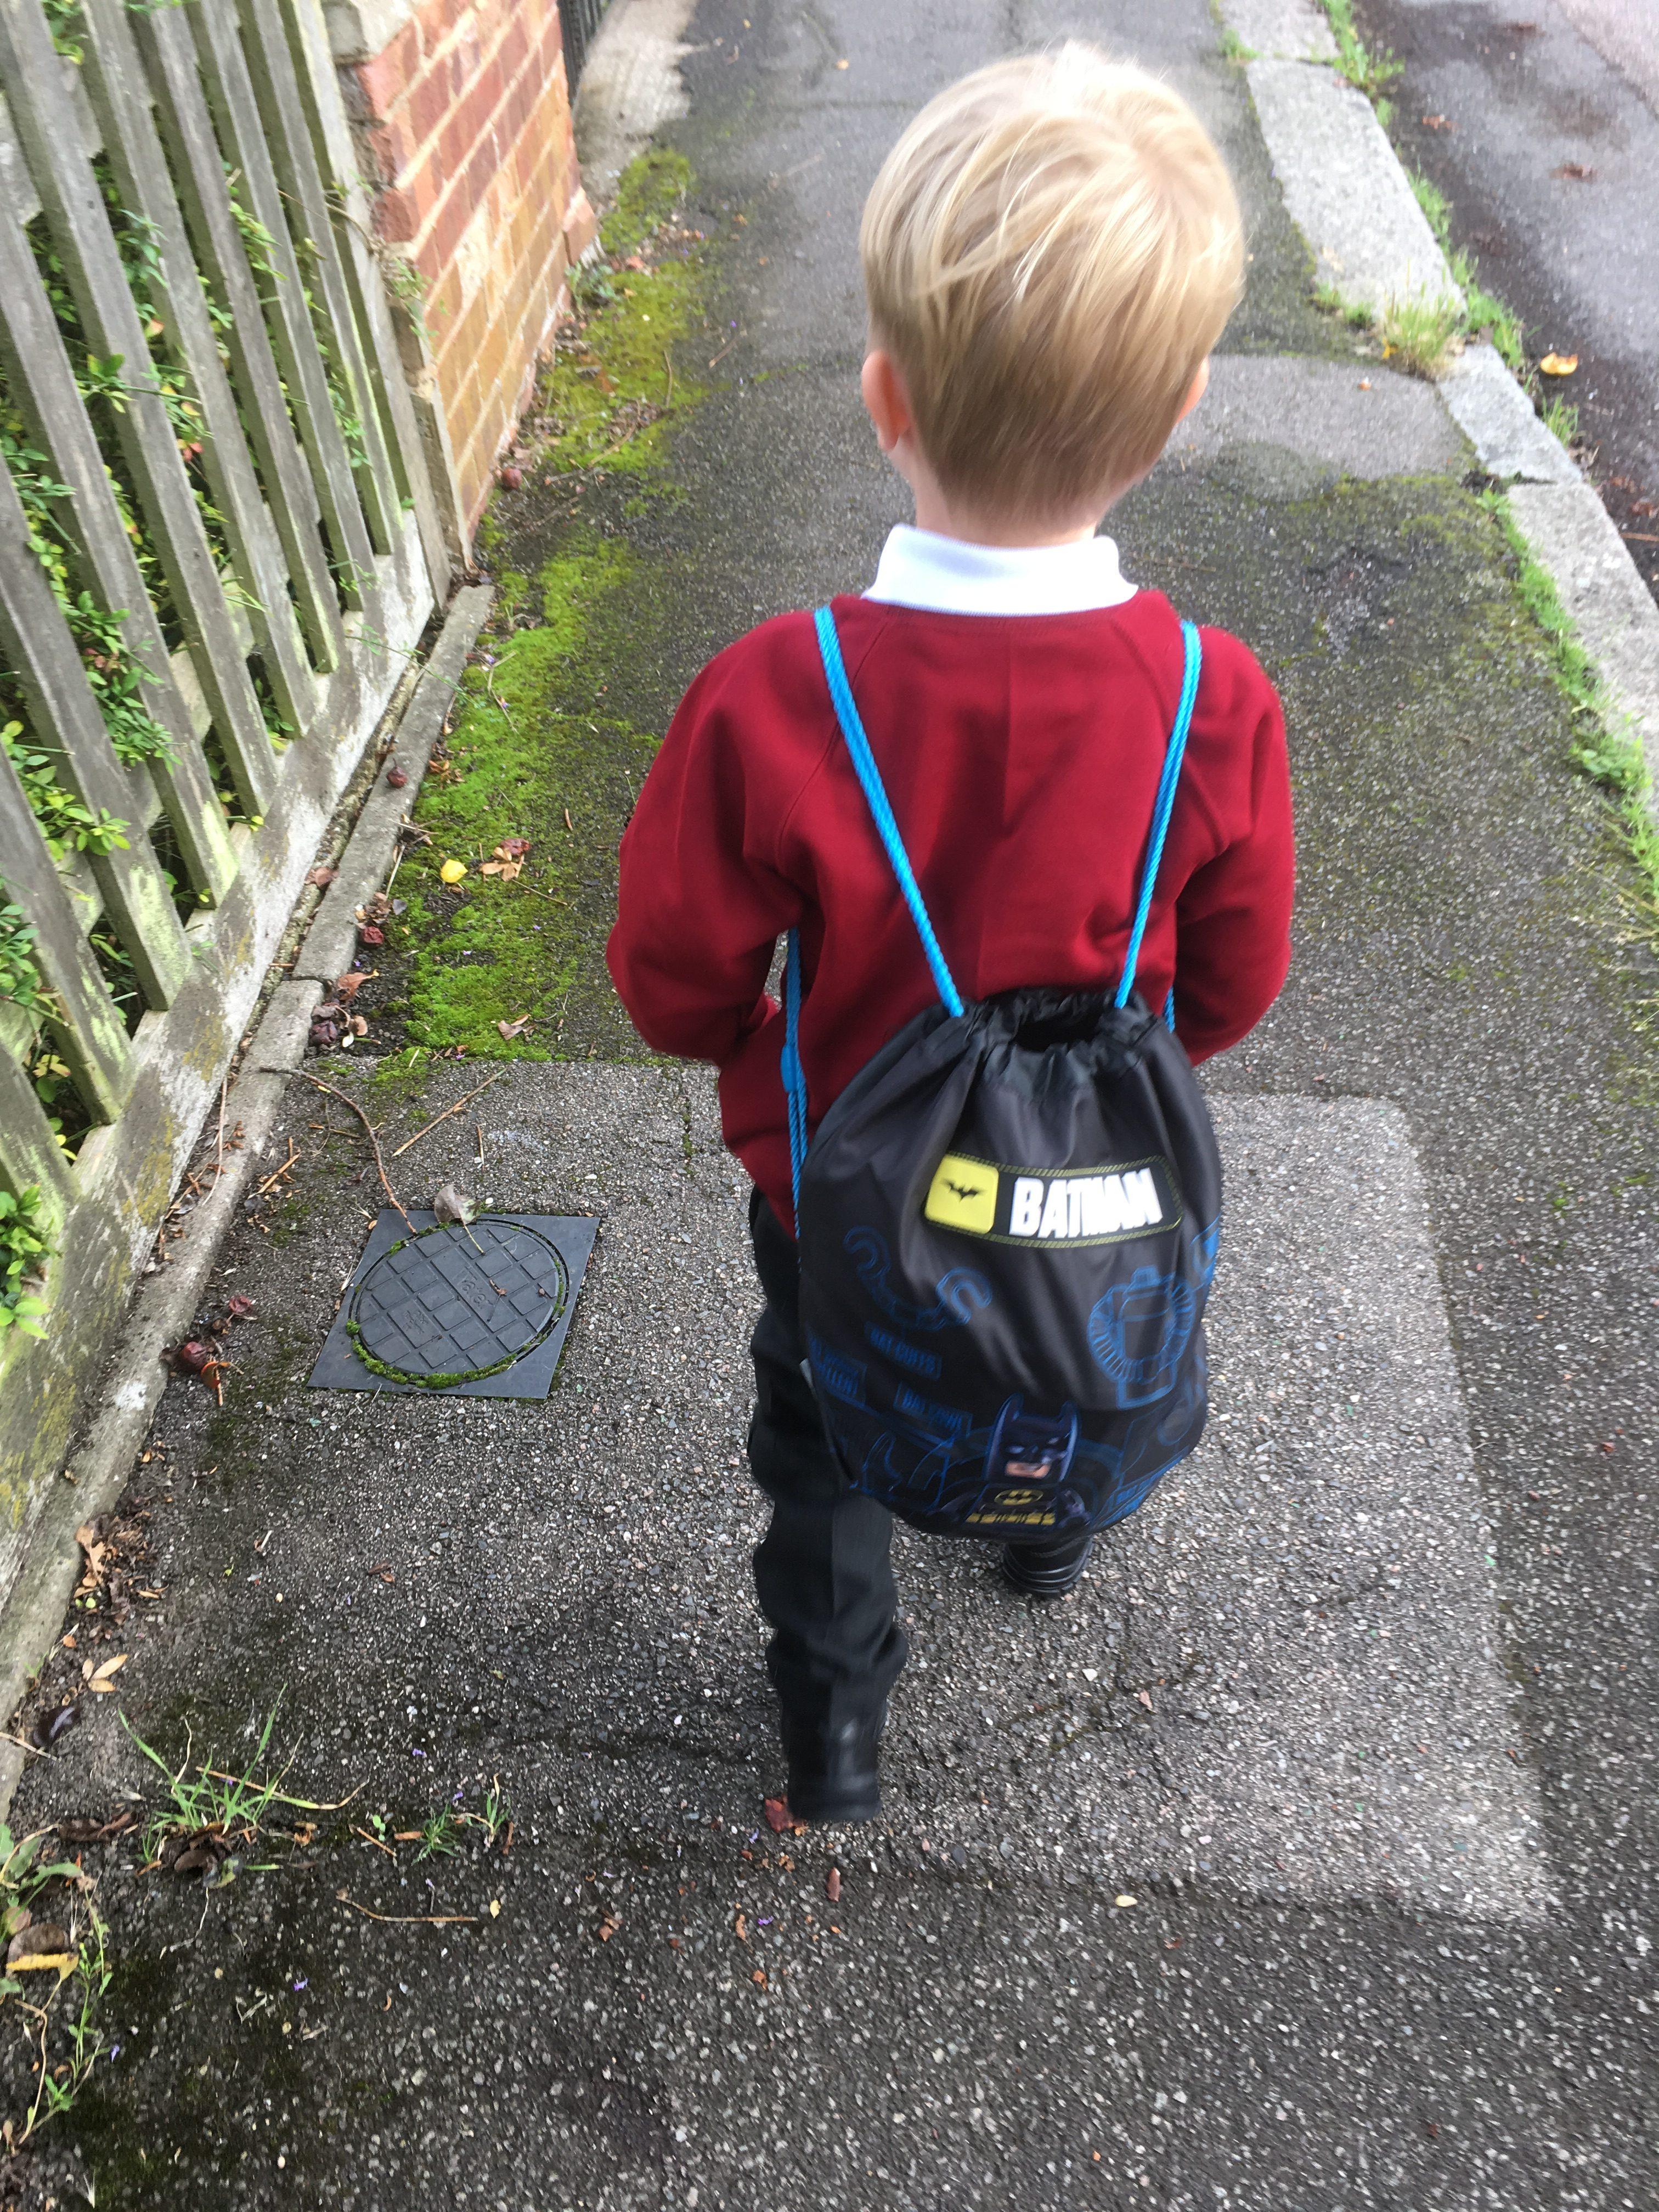 Tiny Chipmunk boy heading to school